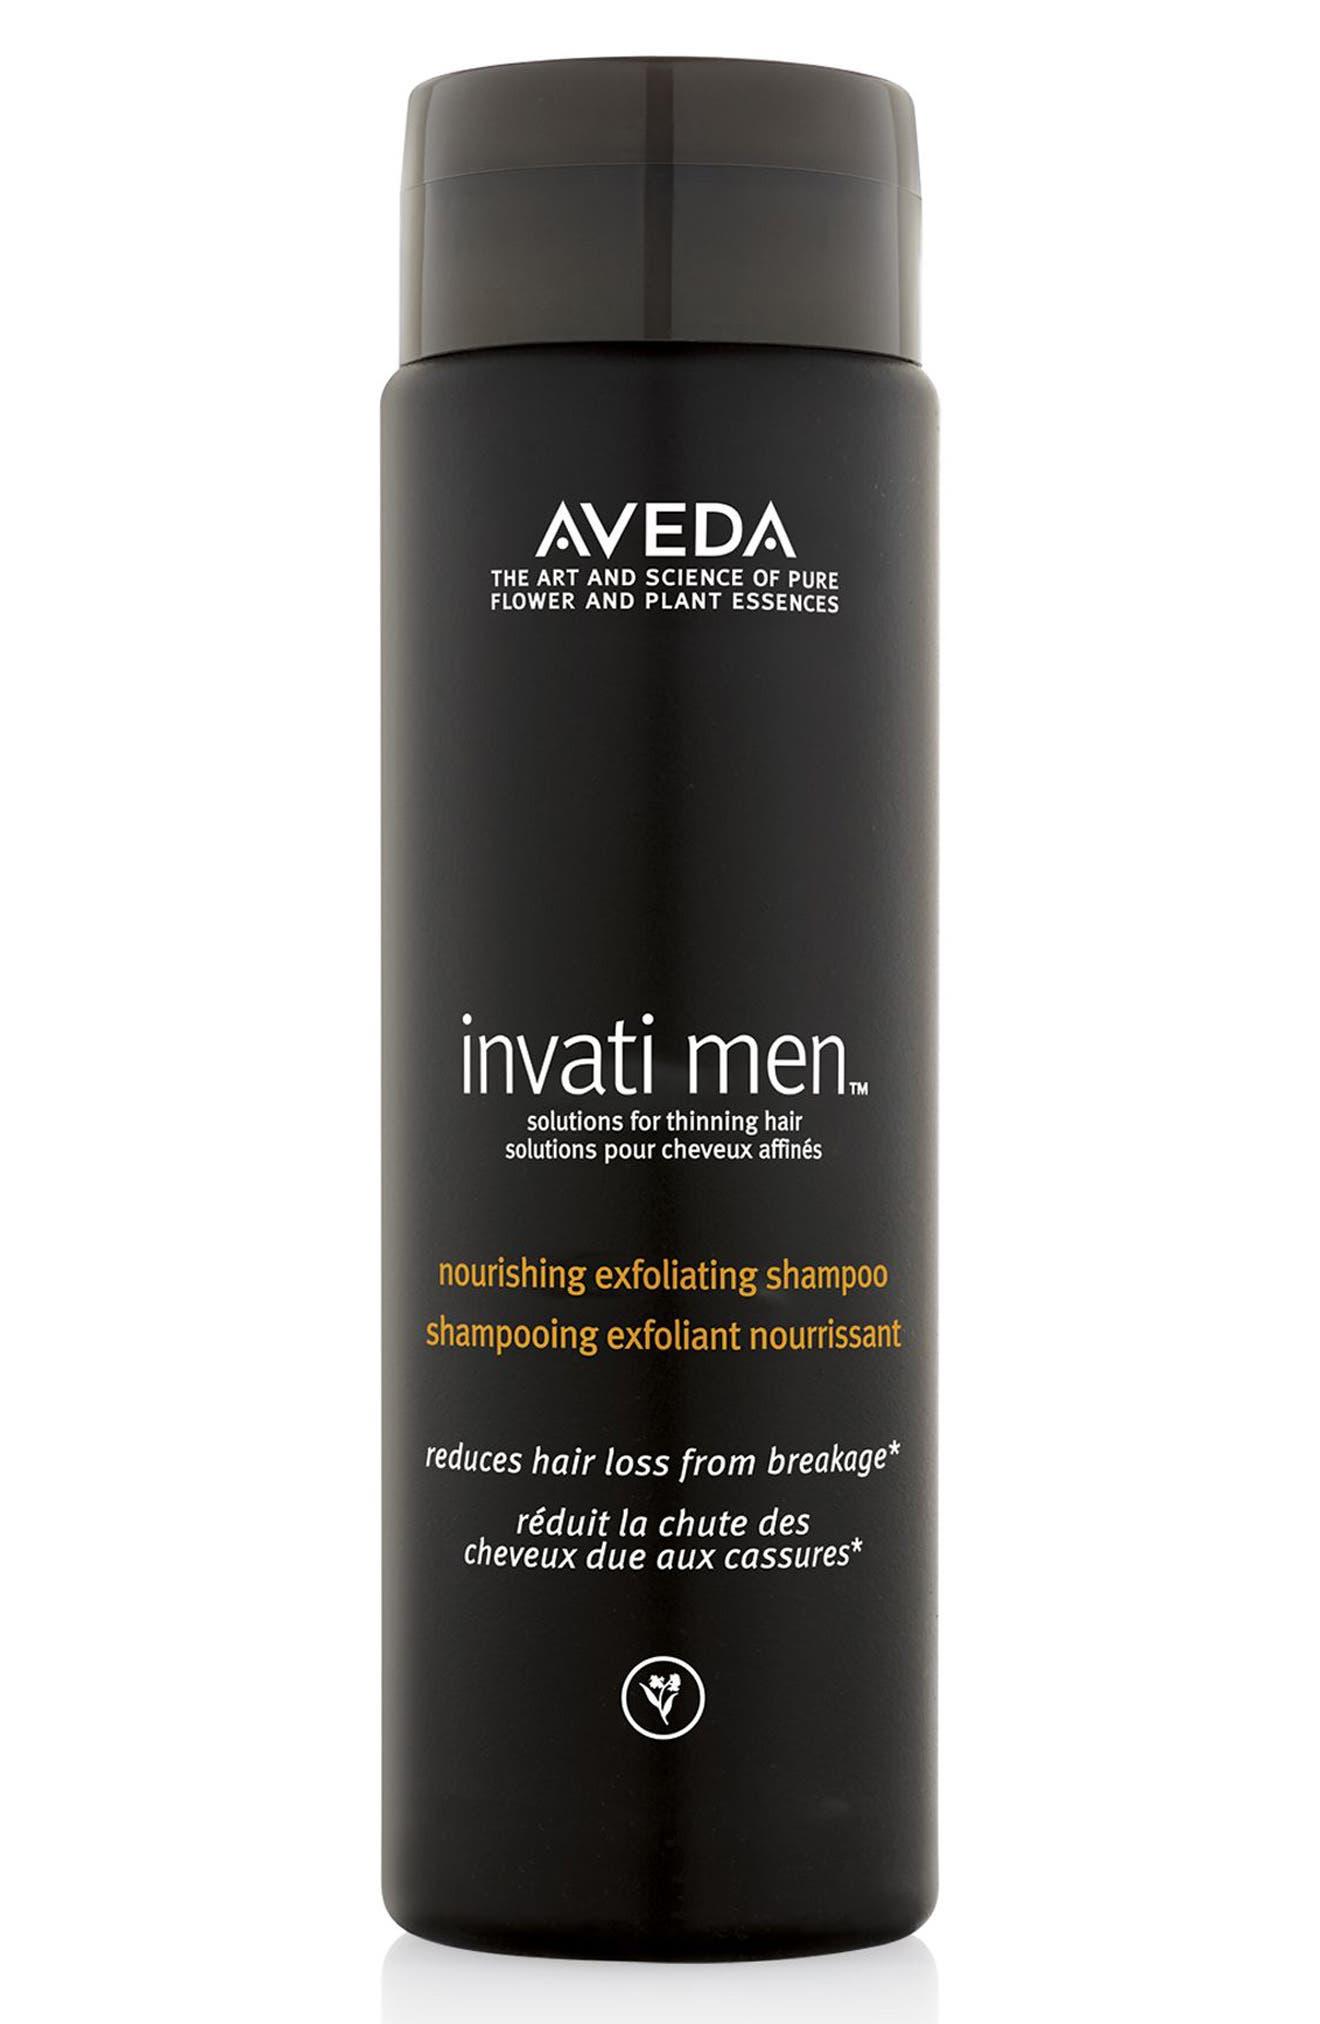 Invati Men(TM) Nourishing Exfoliating Shampoo